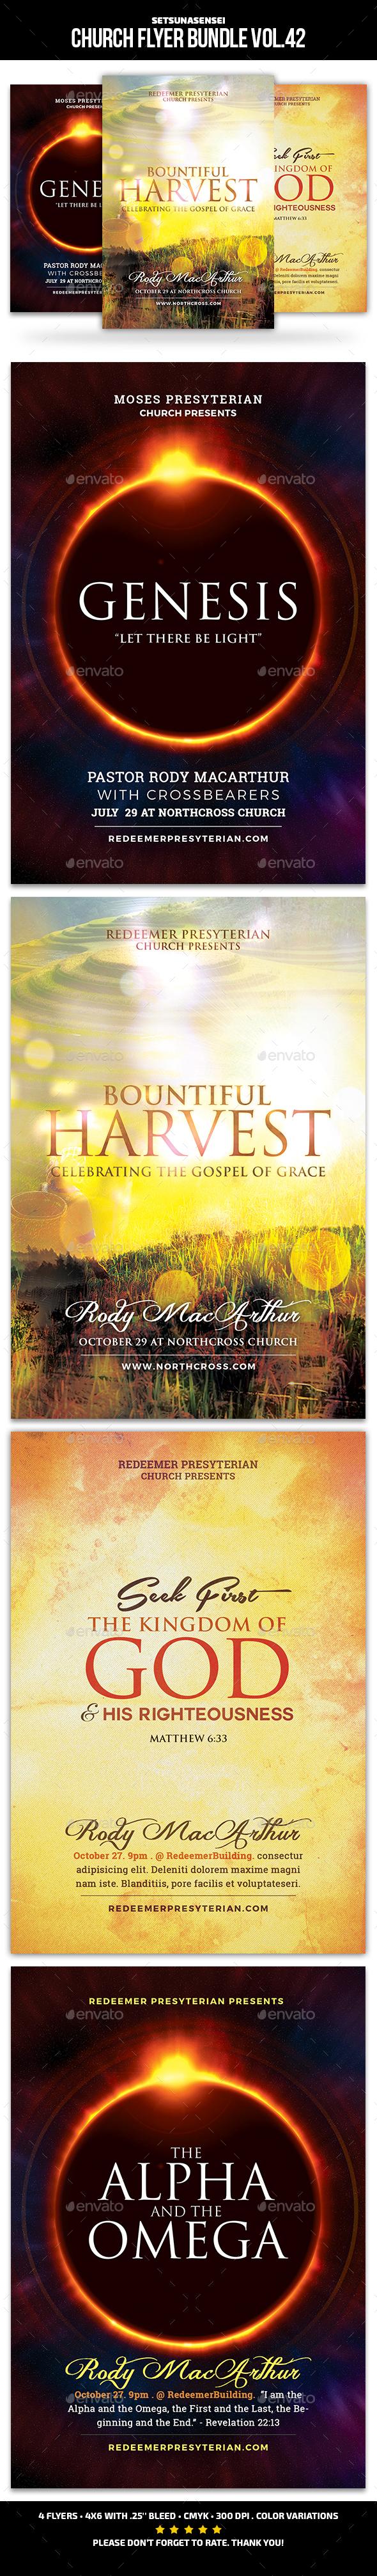 Church Flyer Bundle Vol. 42 - Church Flyers